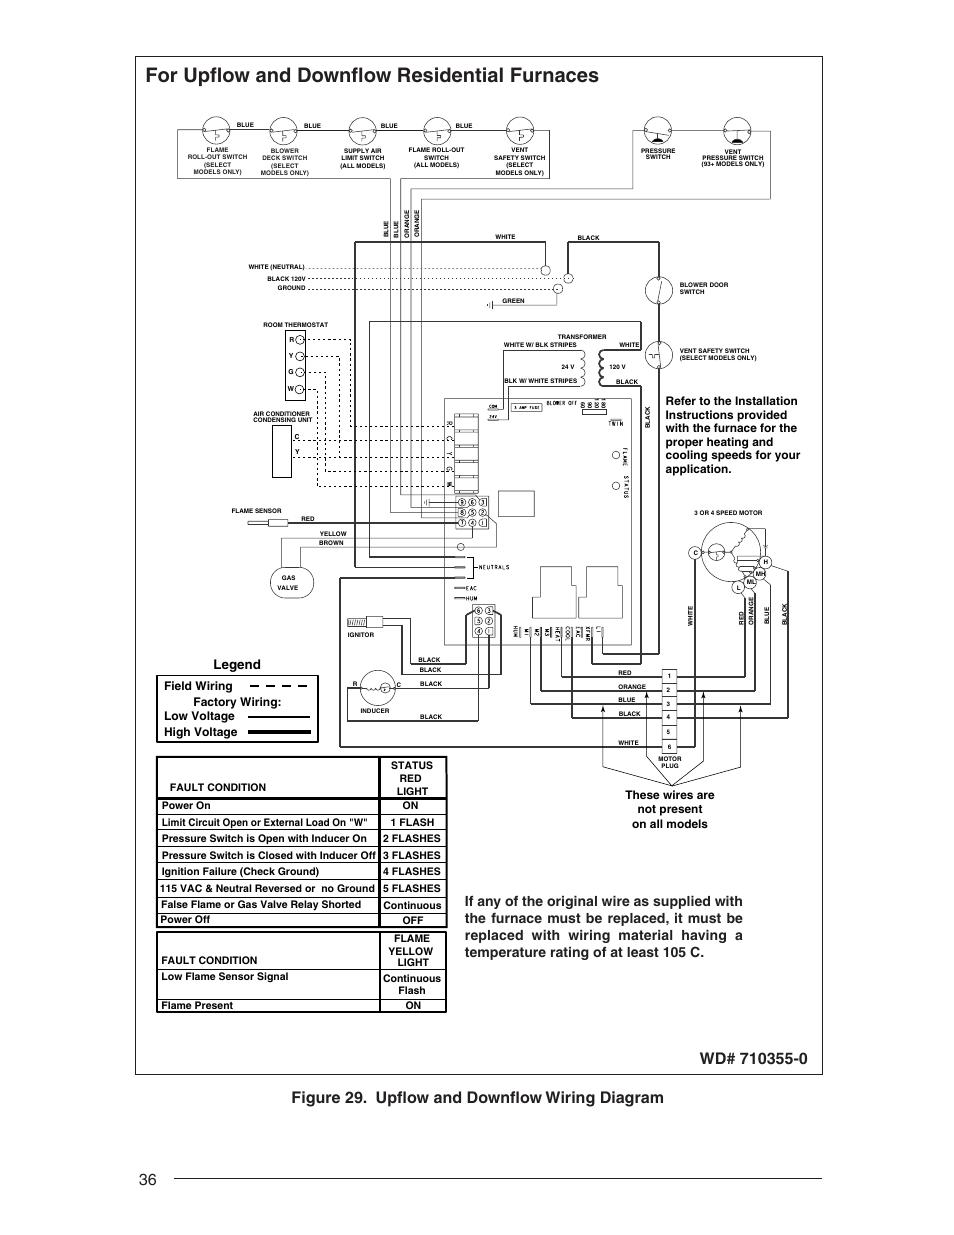 hight resolution of e2eb 017ha wiring diagram transformer diagrams wiring e2eb 012ha wiring diagram nordyne e2eb 017ha wiring diagram